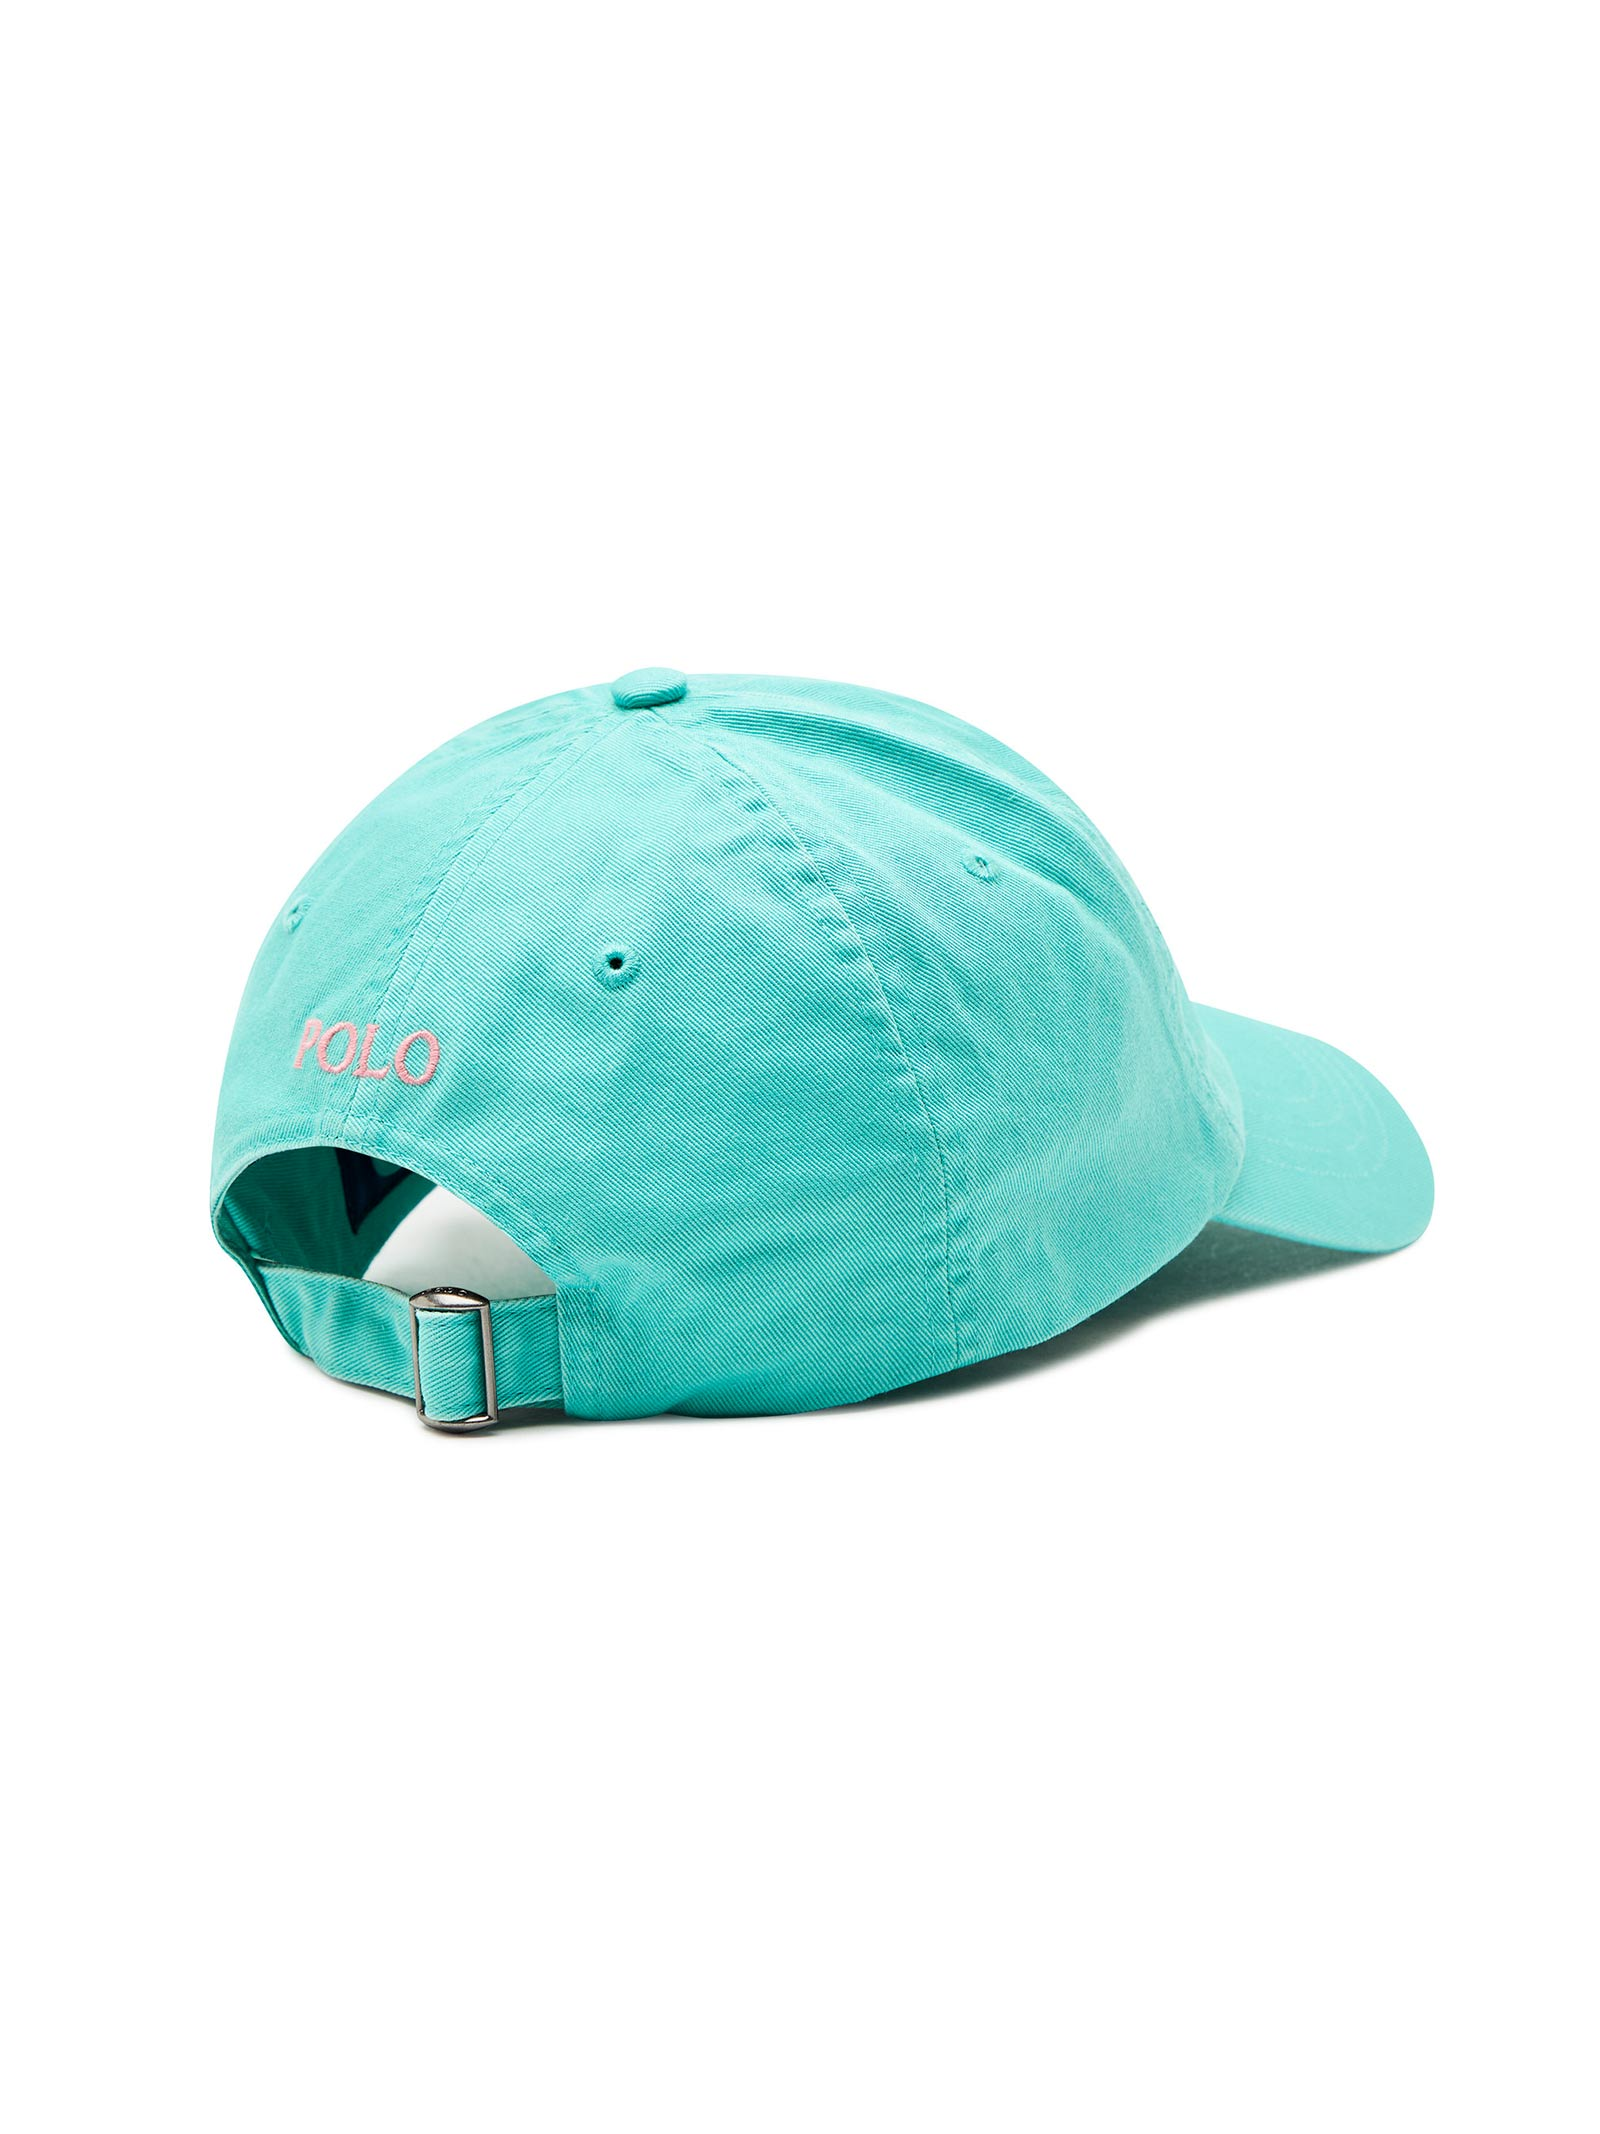 Cappello con visiera turchese RALPH LAUREN | Cappello | 710-811338003